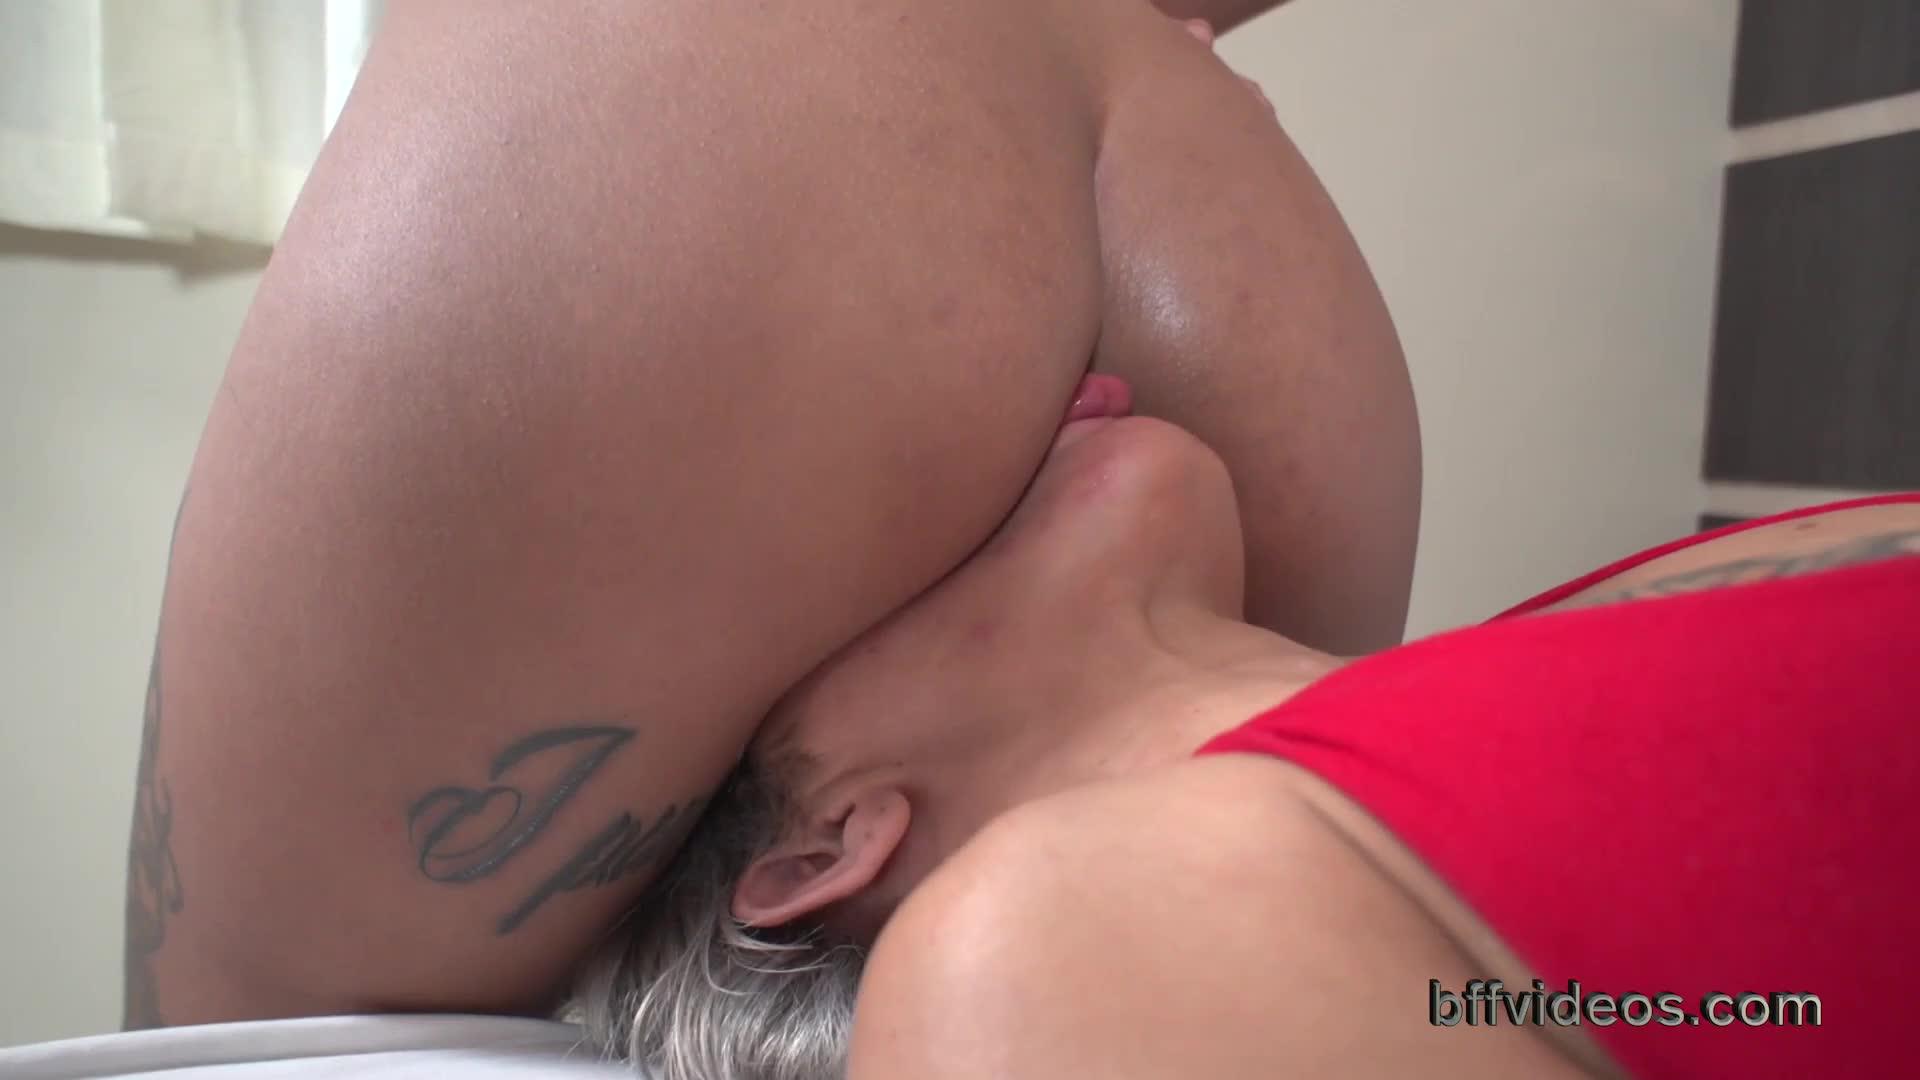 Lesbian Big Ass Humping